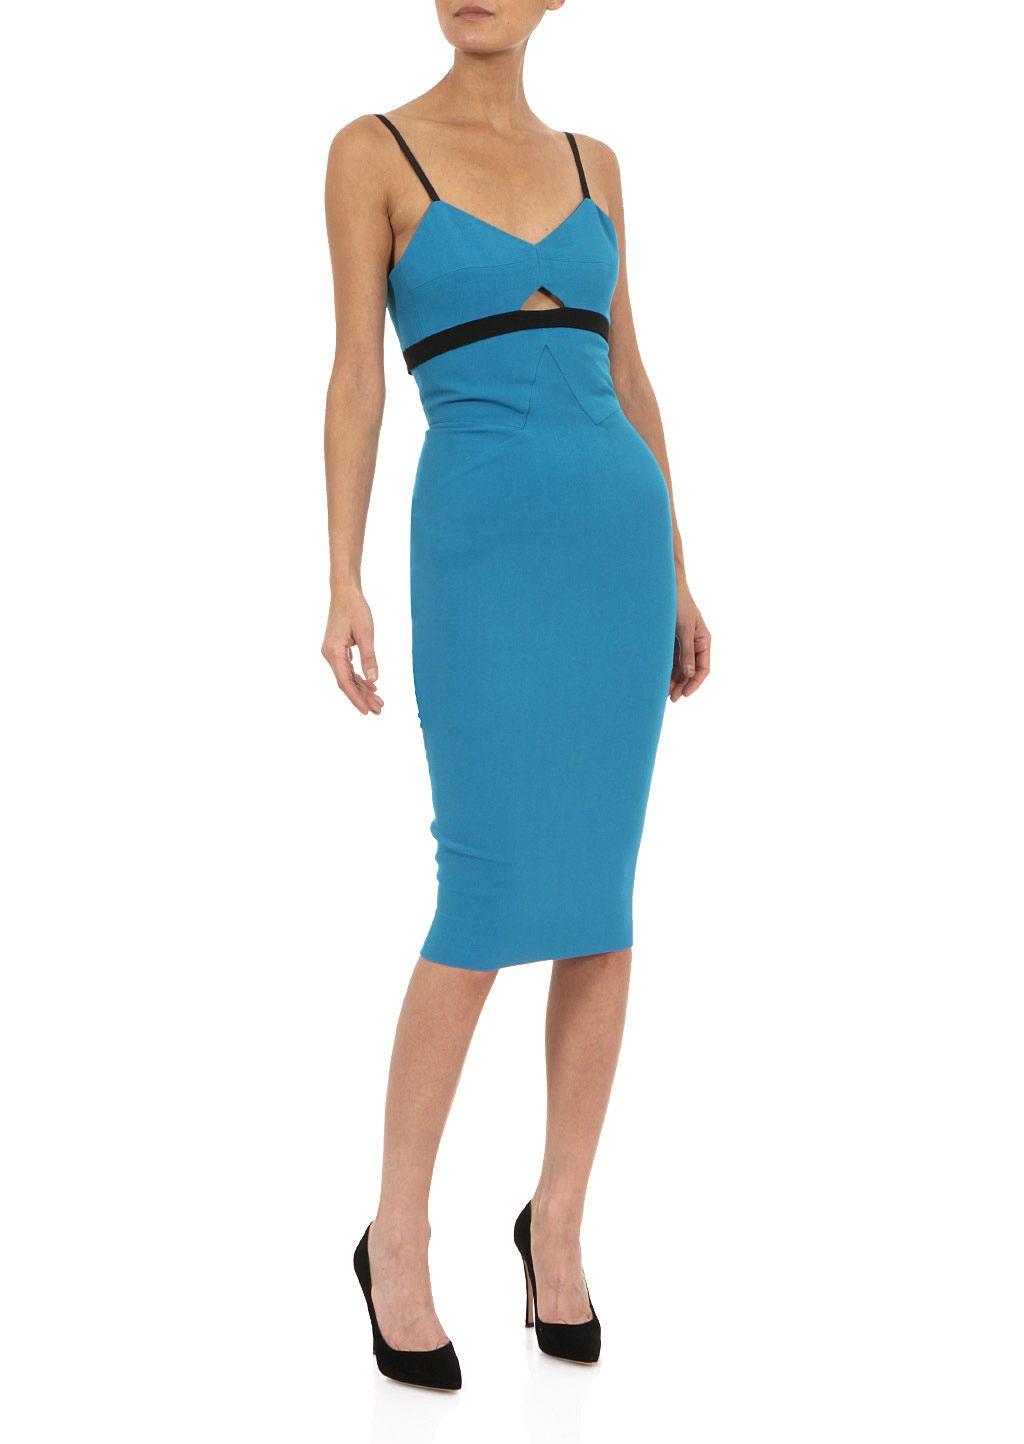 Victoria Beckham Dresses Victoria Beckham Blue Wool And Silk Crepe Sheath Dress Montaigne Market [ 1444 x 1024 Pixel ]